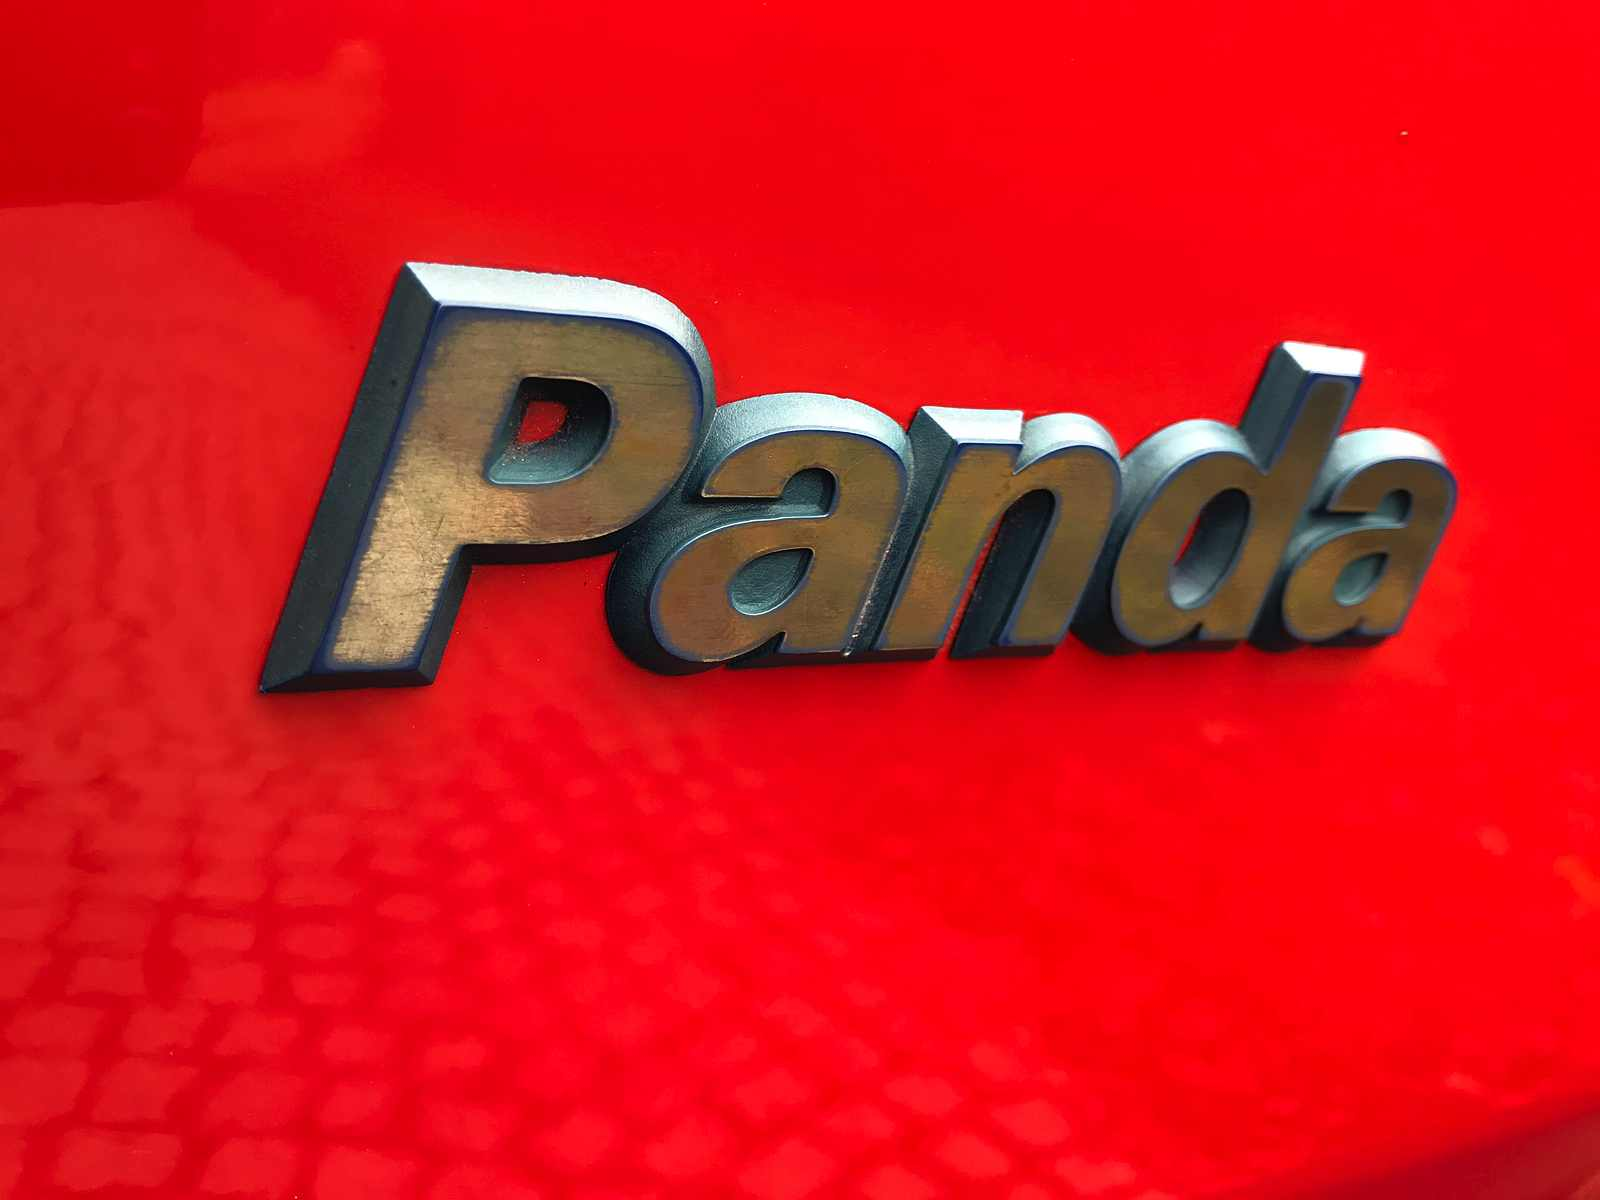 Prossinger Werbeagentur fotografiert: Fotostrecke Fiat Panda 141 Allrad